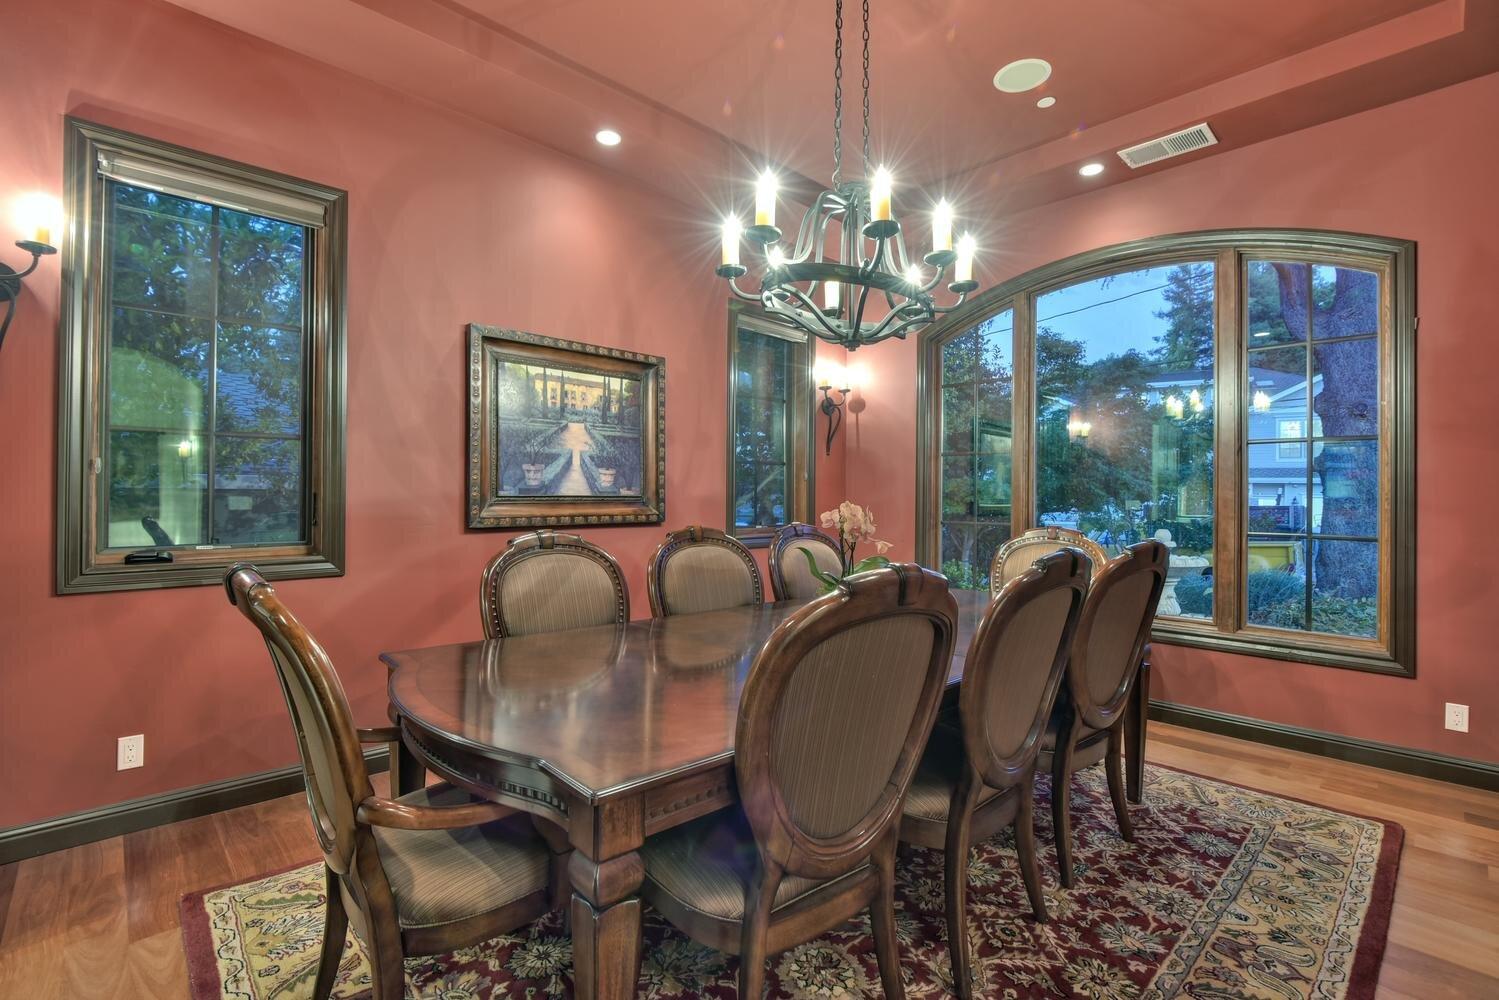 16021 Winterbrook Rd Los Gatos-large-020-010-Dining Room-1499x1000-72dpi.jpg